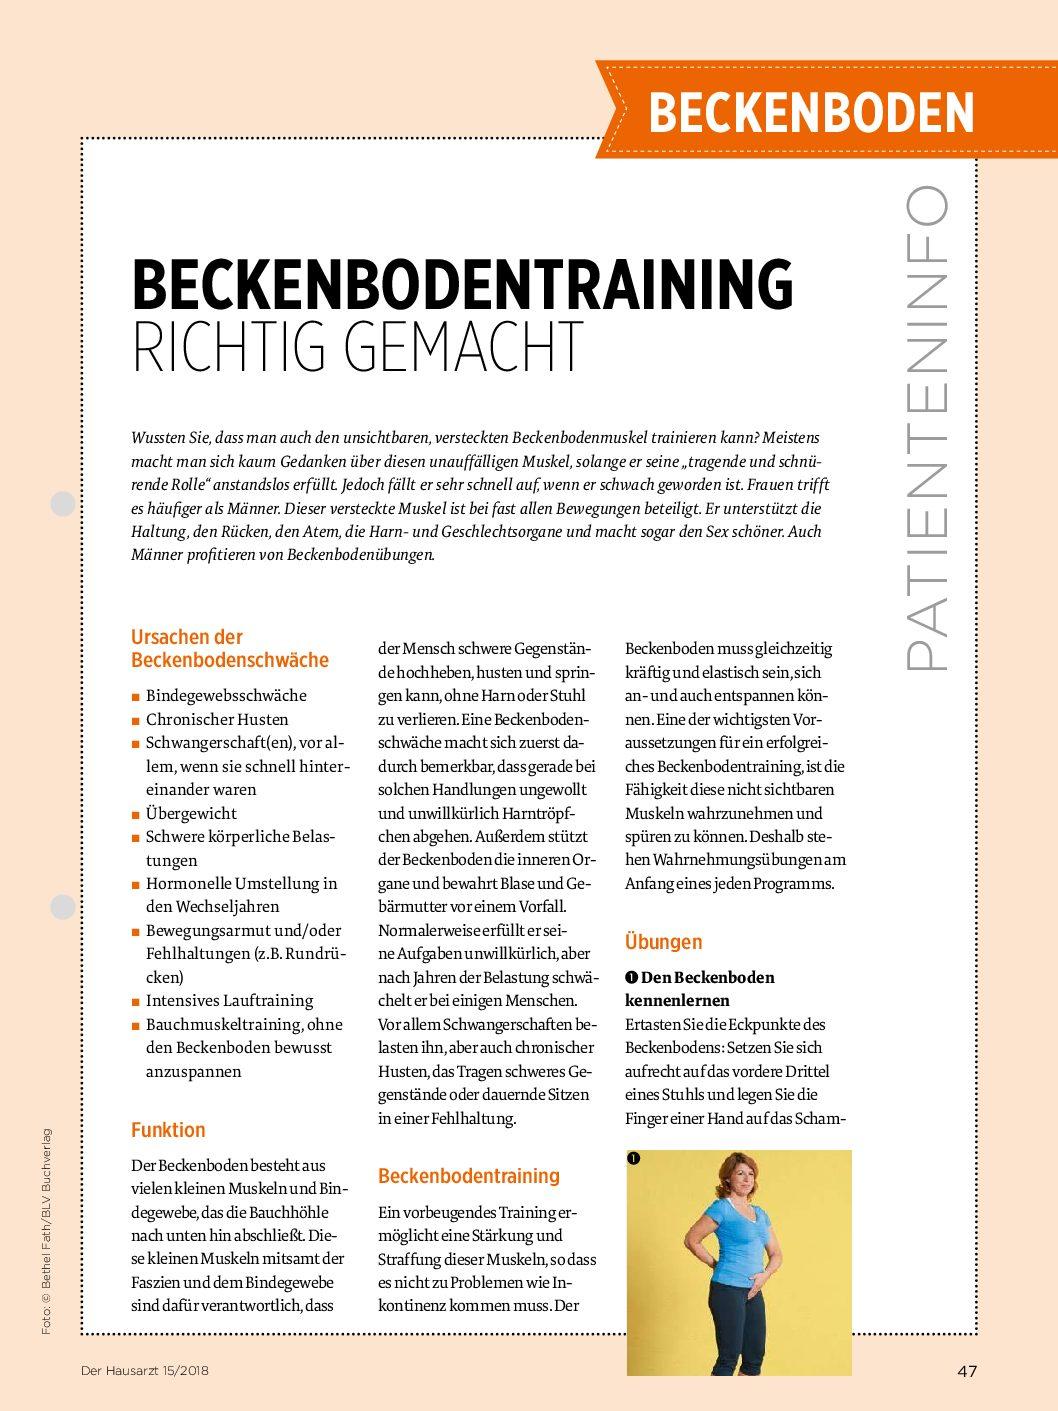 Mann pdf beckenbodentraining übungen Inkontinenz, Beckenbodentraining